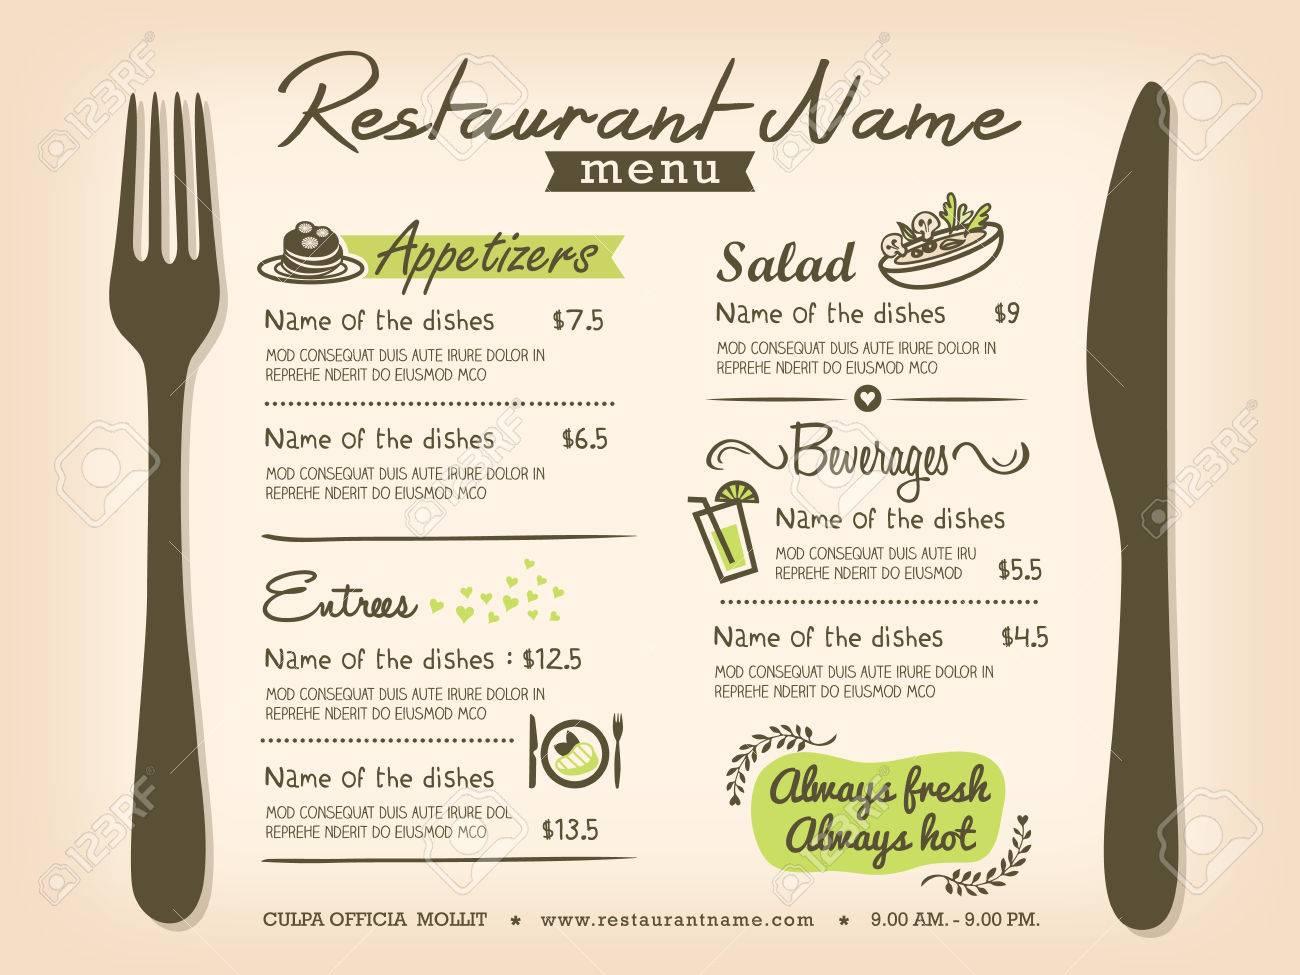 Restaurant Placemat Menu Design Template Layout Royalty Free - Menu layout templates free